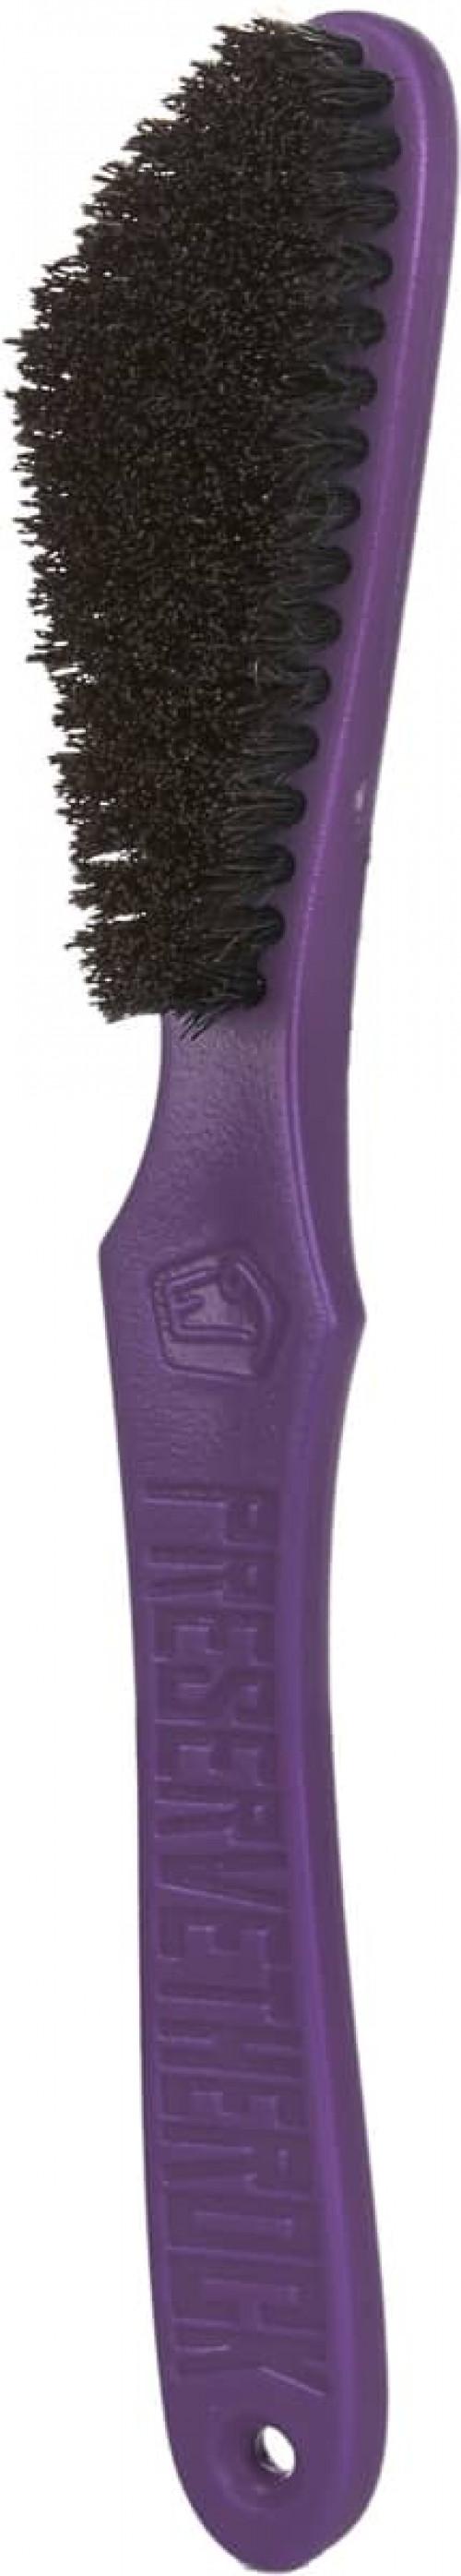 E9 Brush Violet